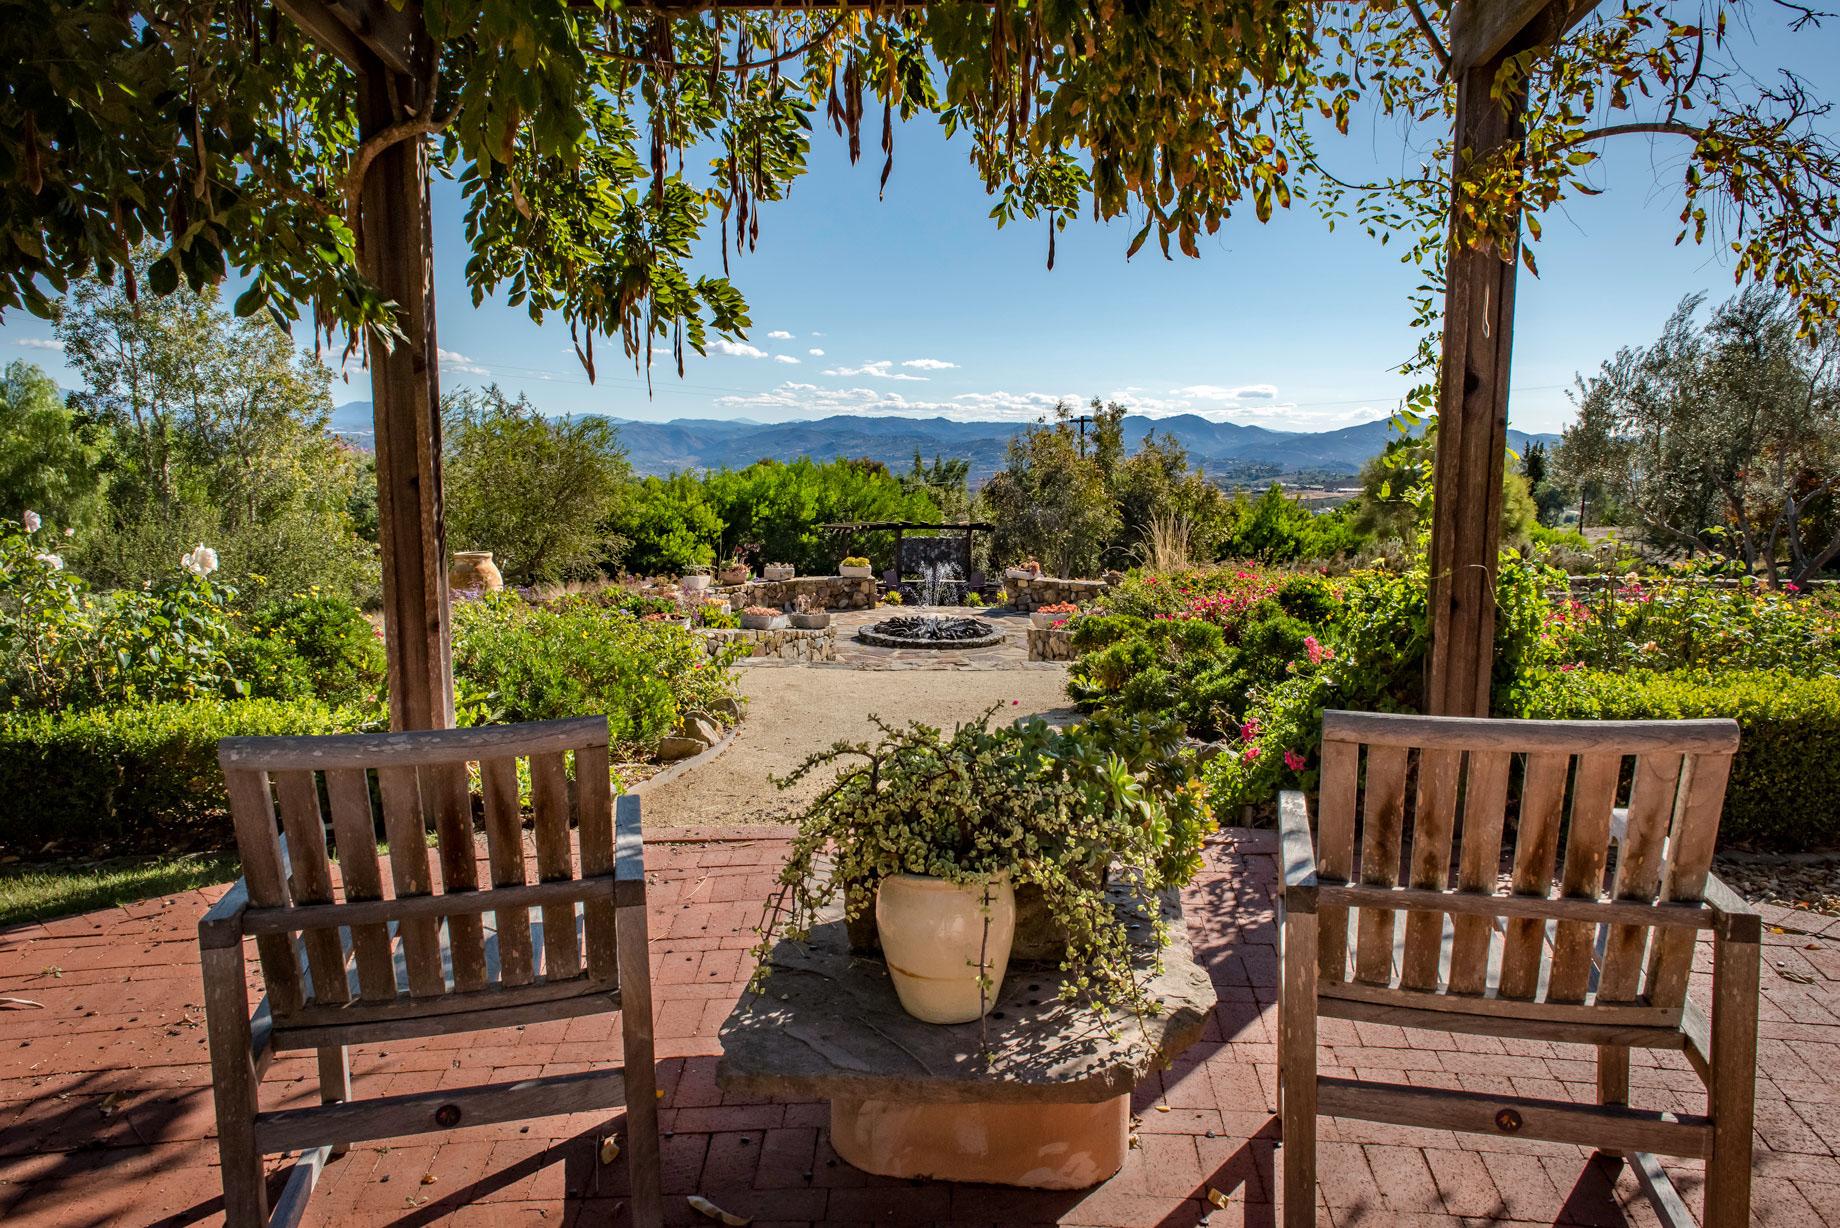 Joseph Beebe San Diego Home Garden Magazine June 2016